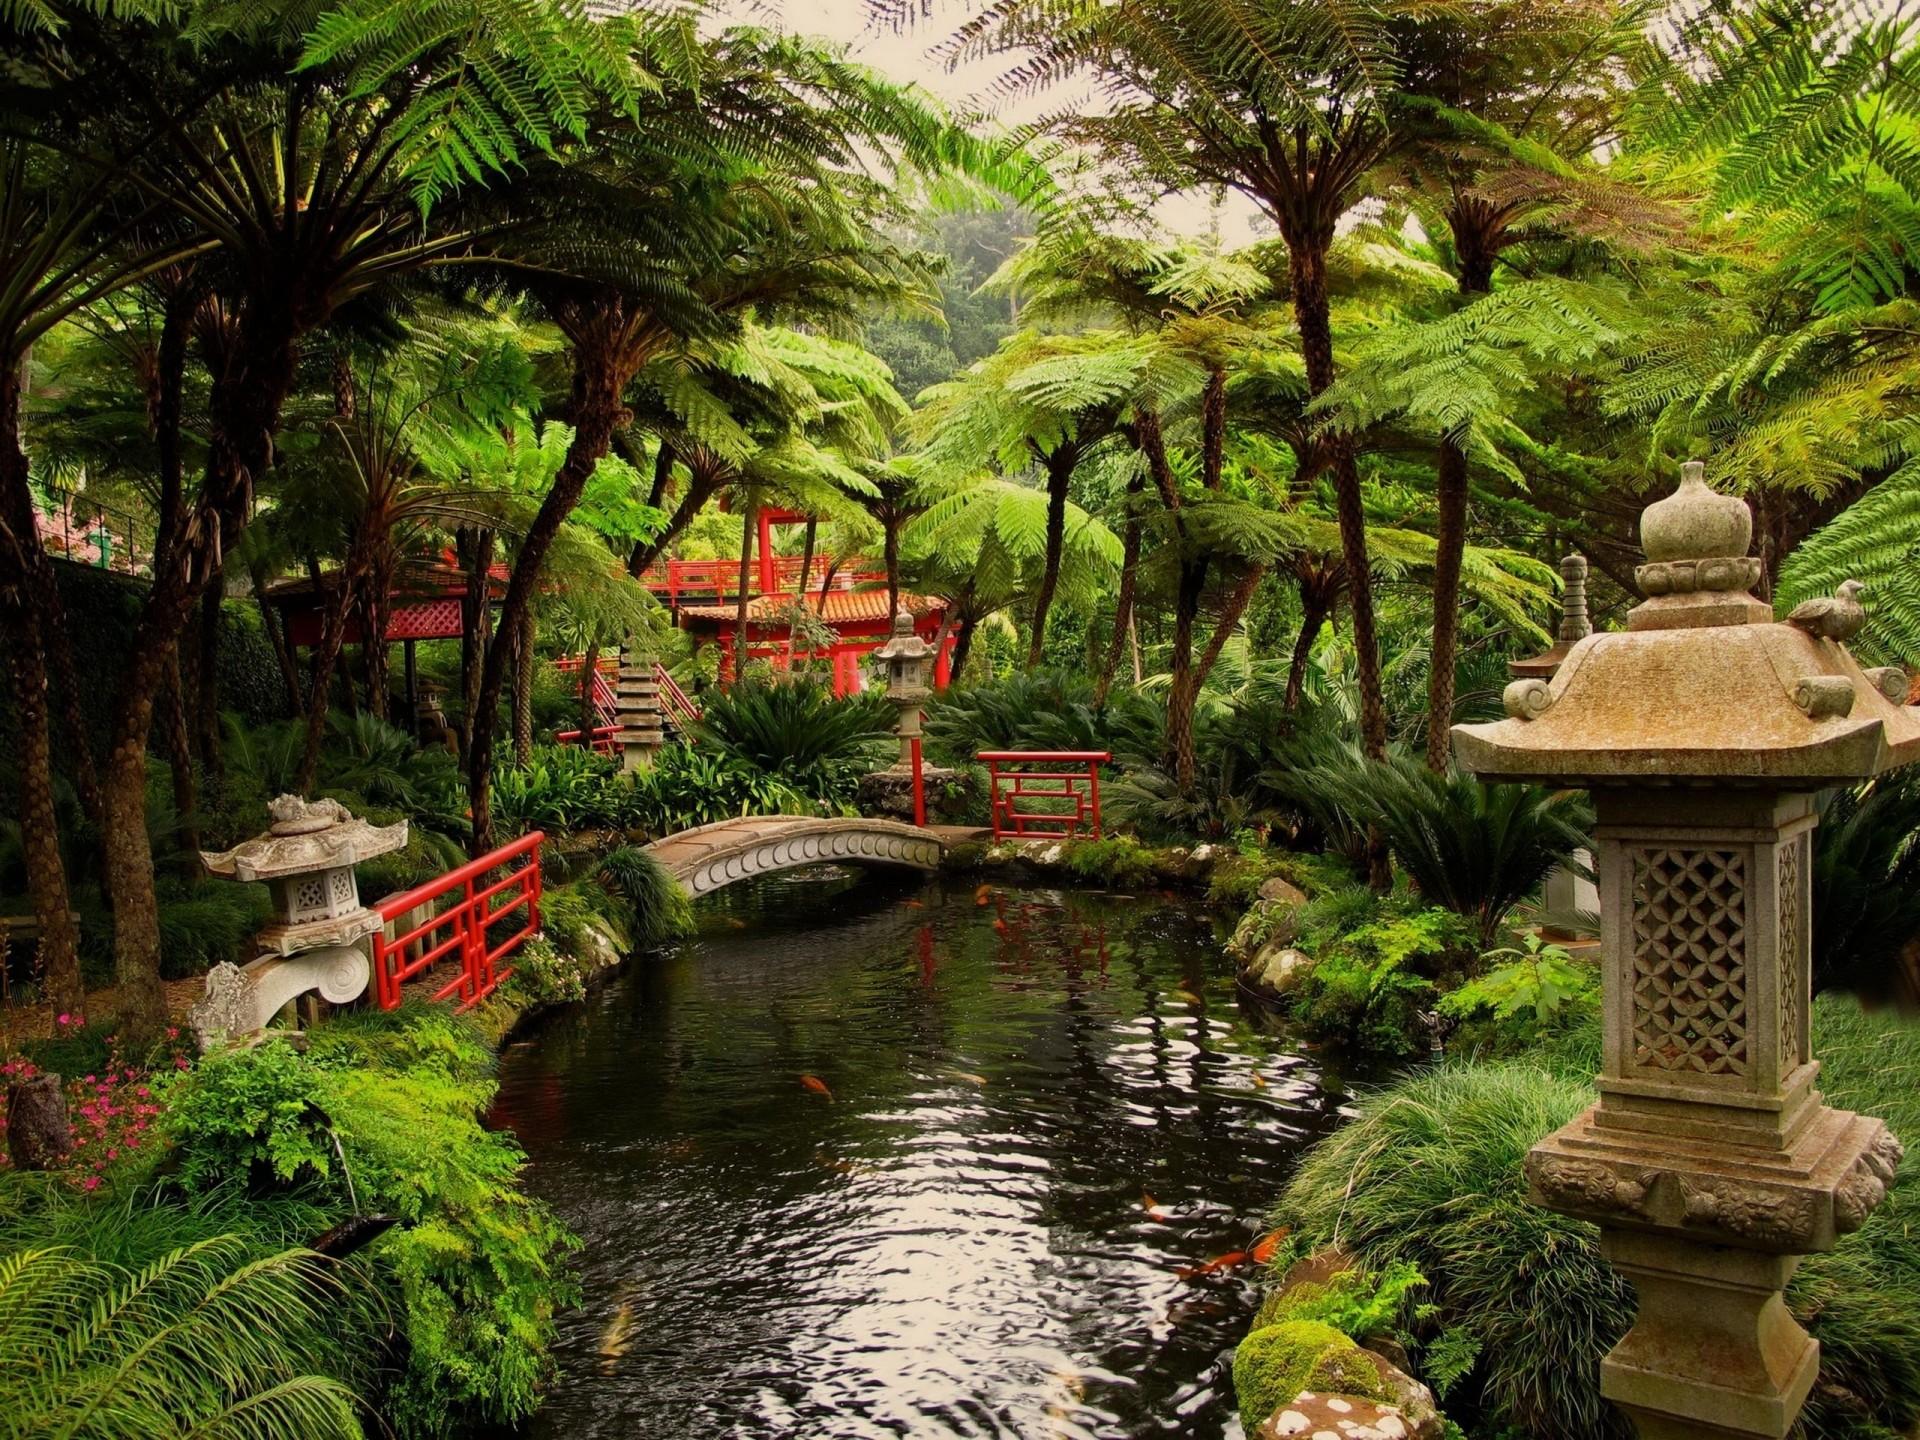 #Japanese #Garden [Nature • Miscellaneous] #bridge #desktop #wallpapers #